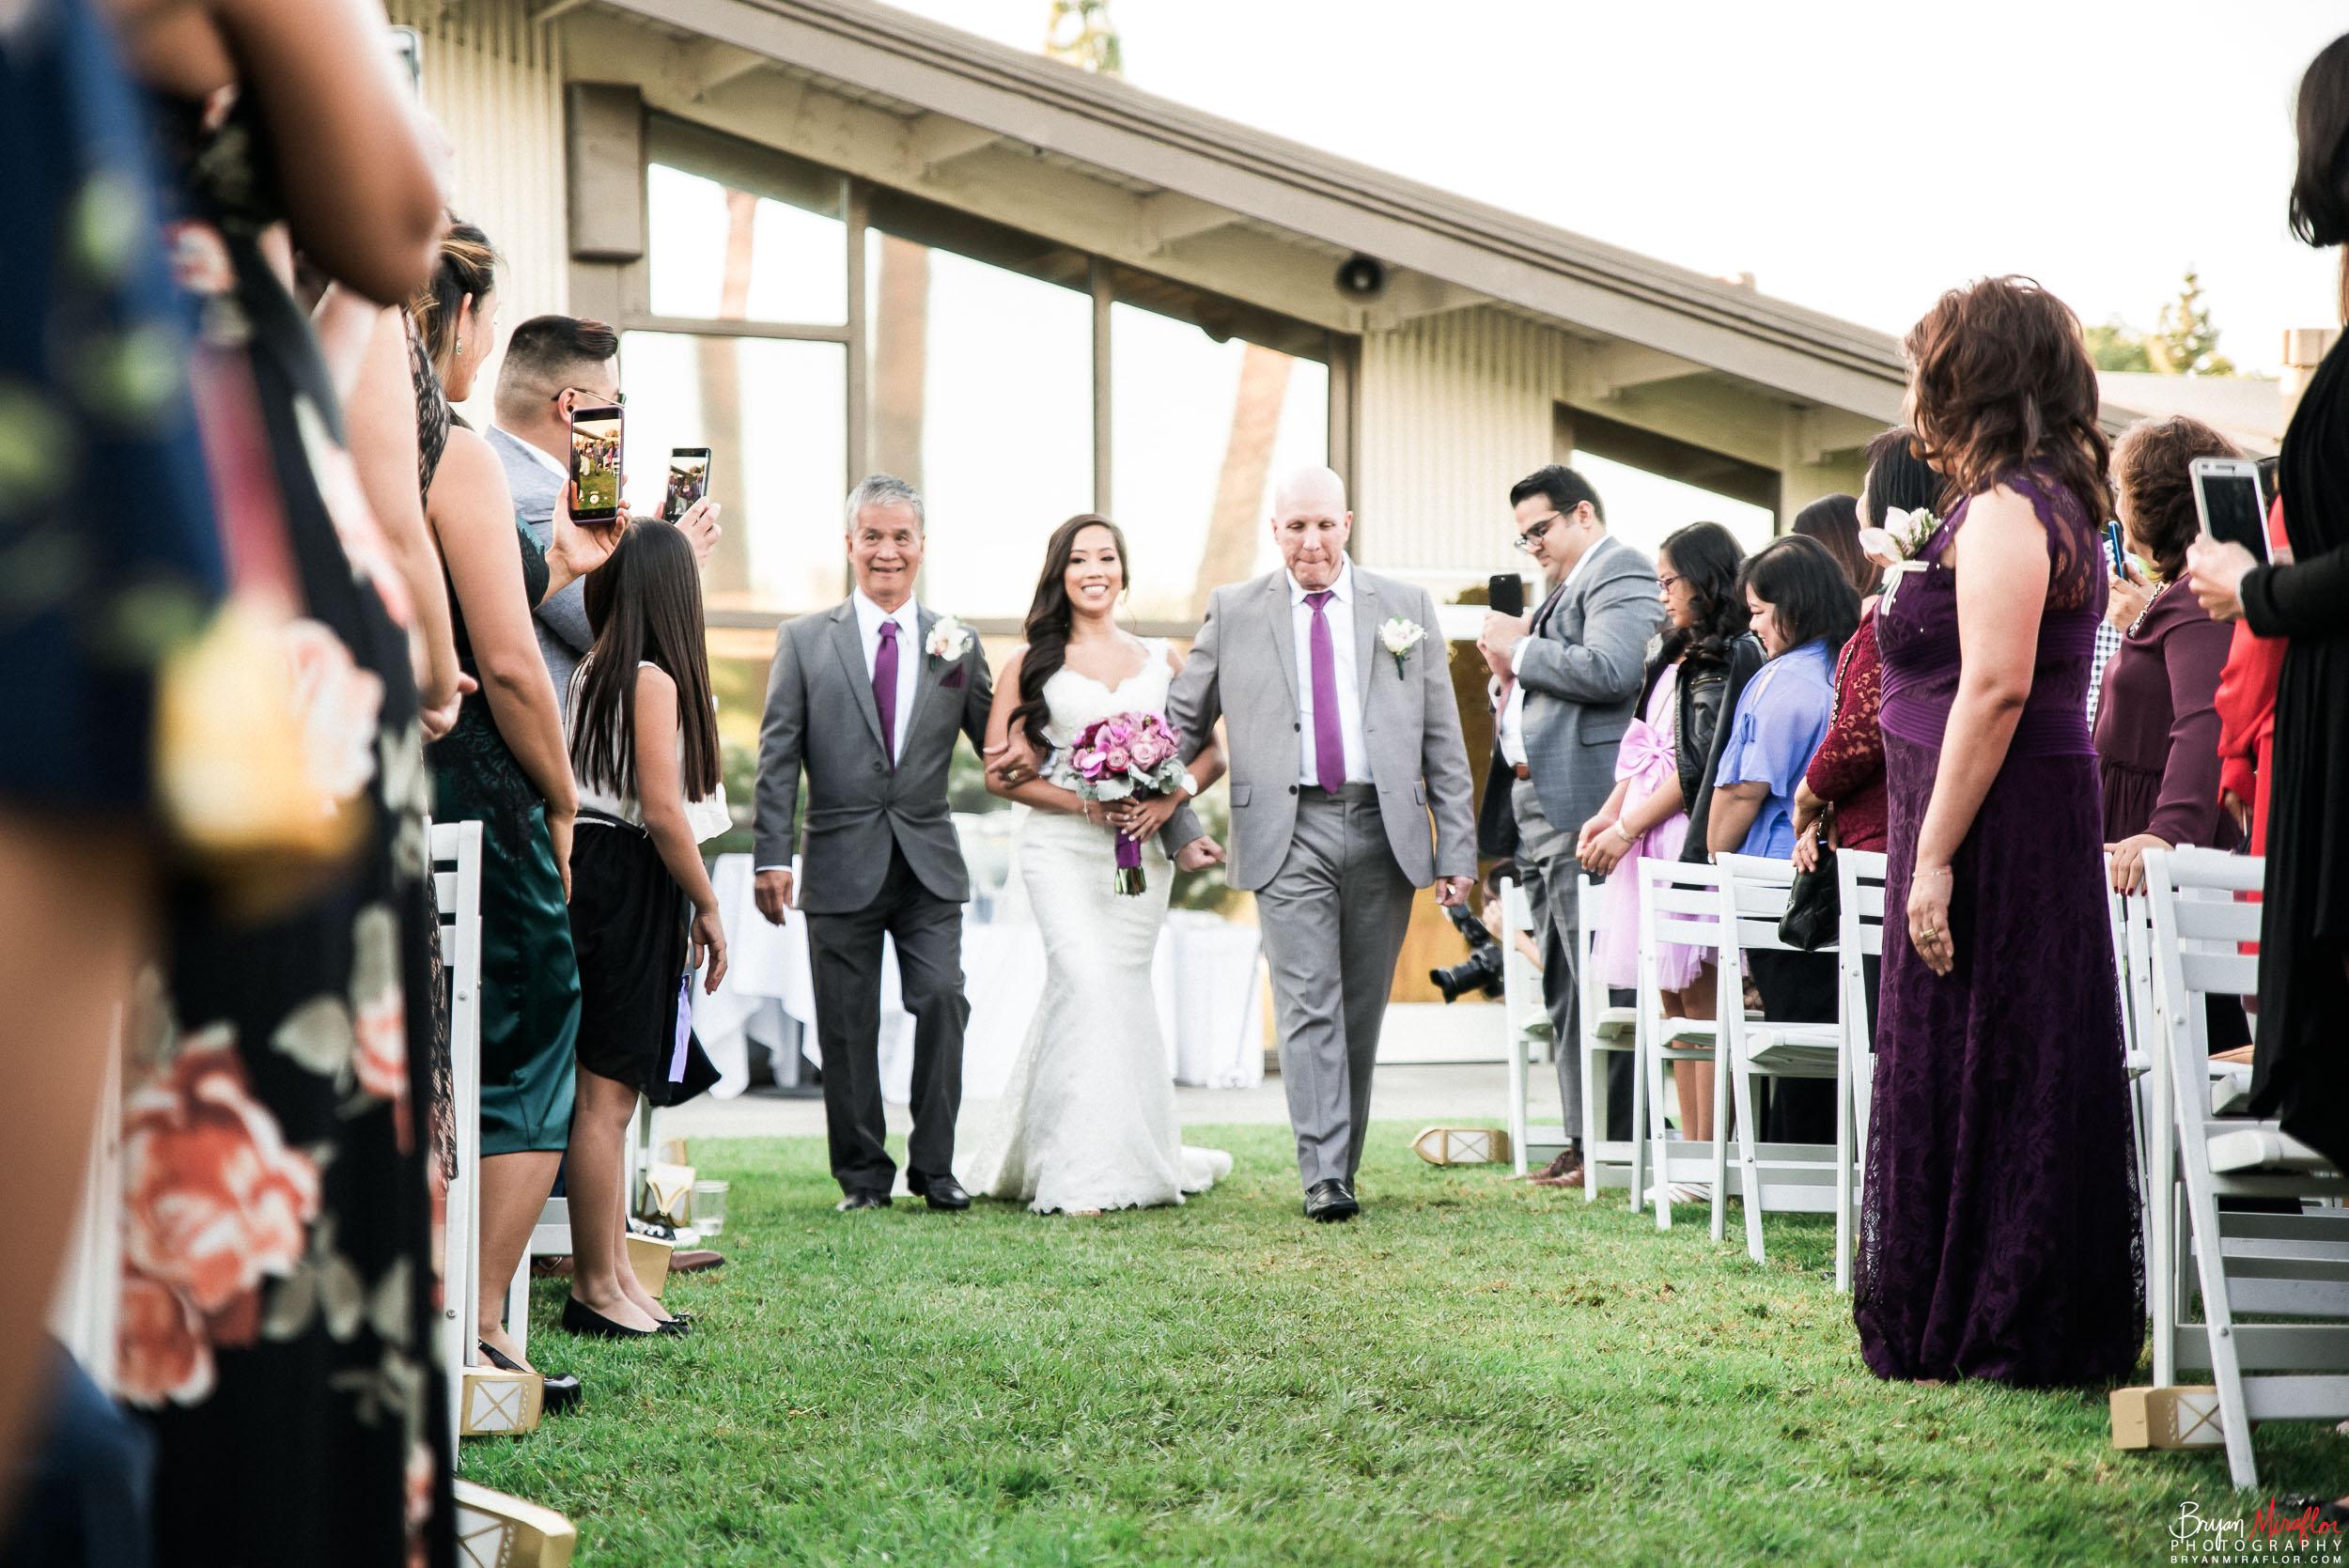 Bryan-Miraflor-Photography-Trisha-Dexter-Married-20170923-051.jpg